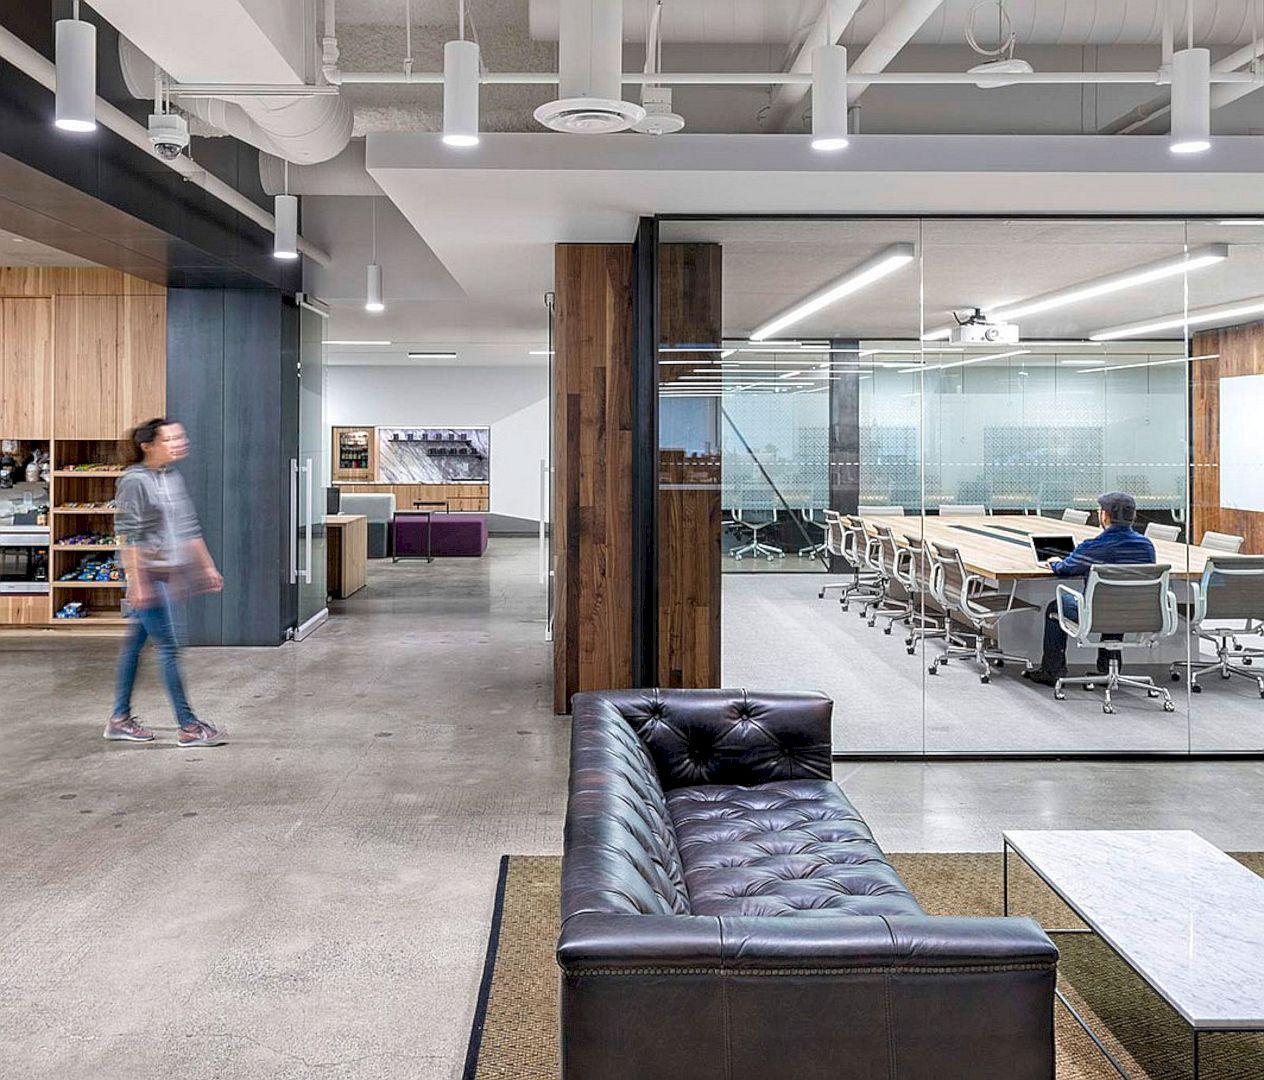 Superbe Best Modern And Gorgeous Office Interior Design Ideas  Https://www.futuristarchitecture.com/23070 Office Interior.html